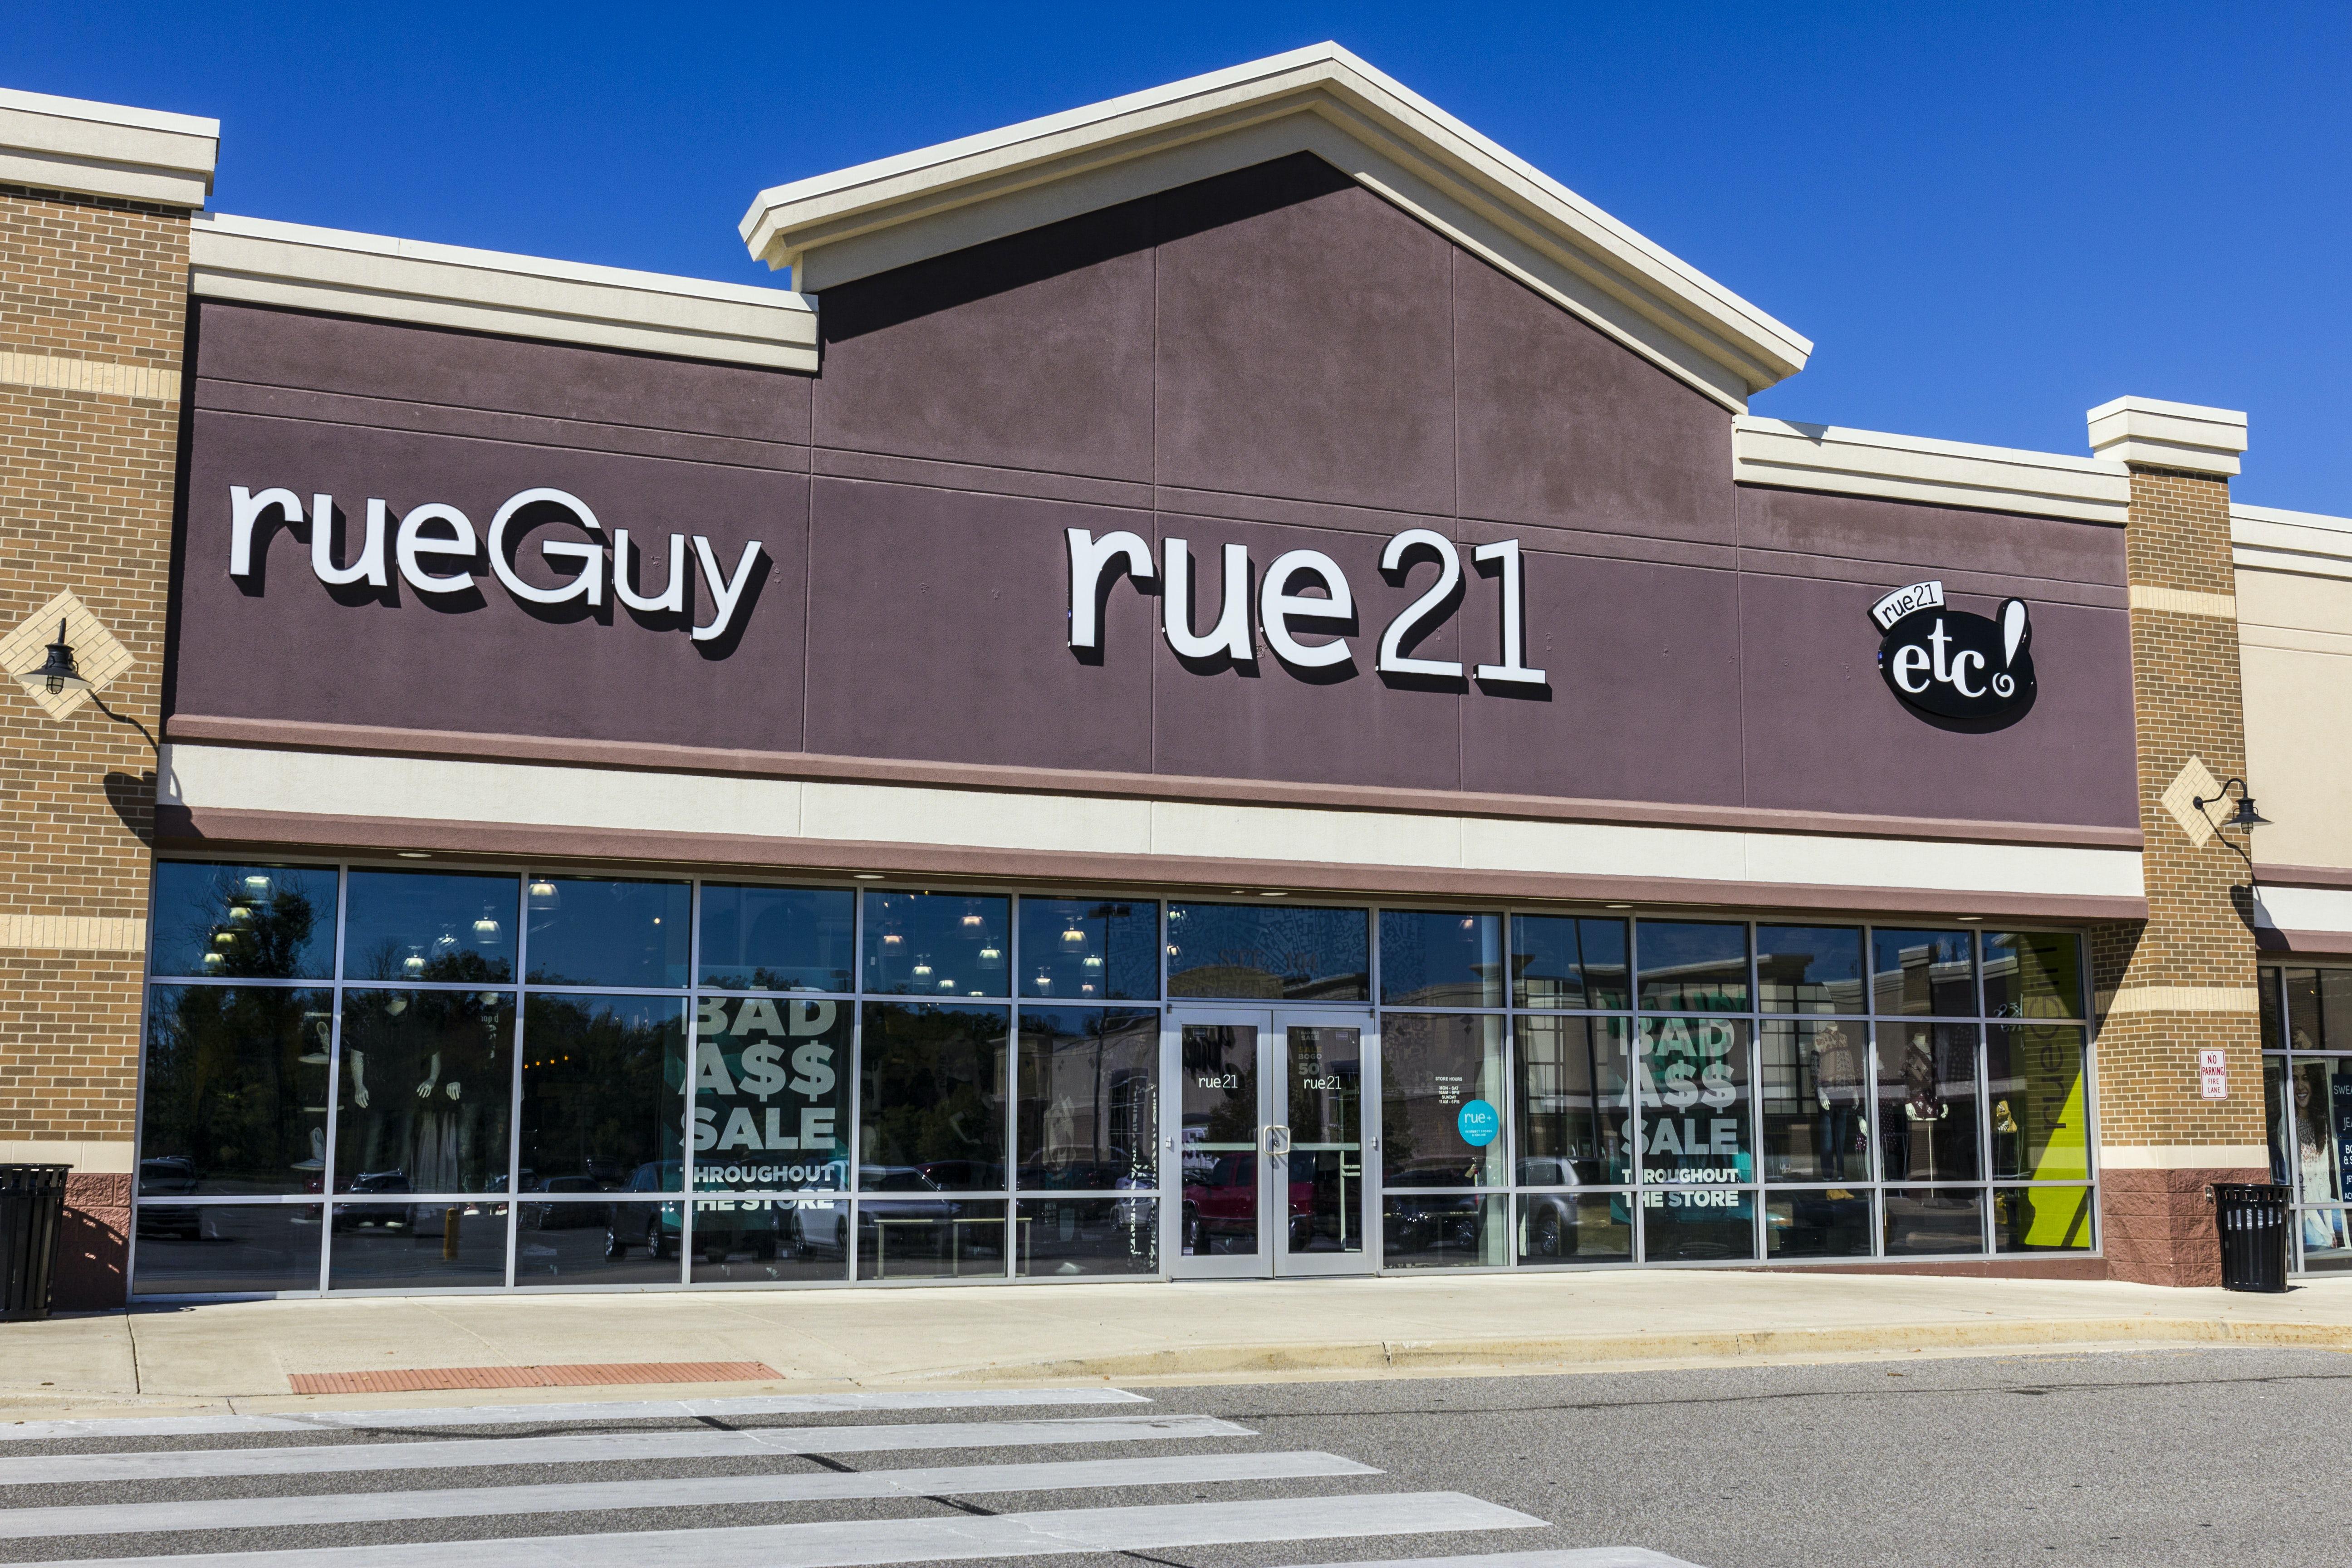 A Rue 21 store | Source: Shutterstock